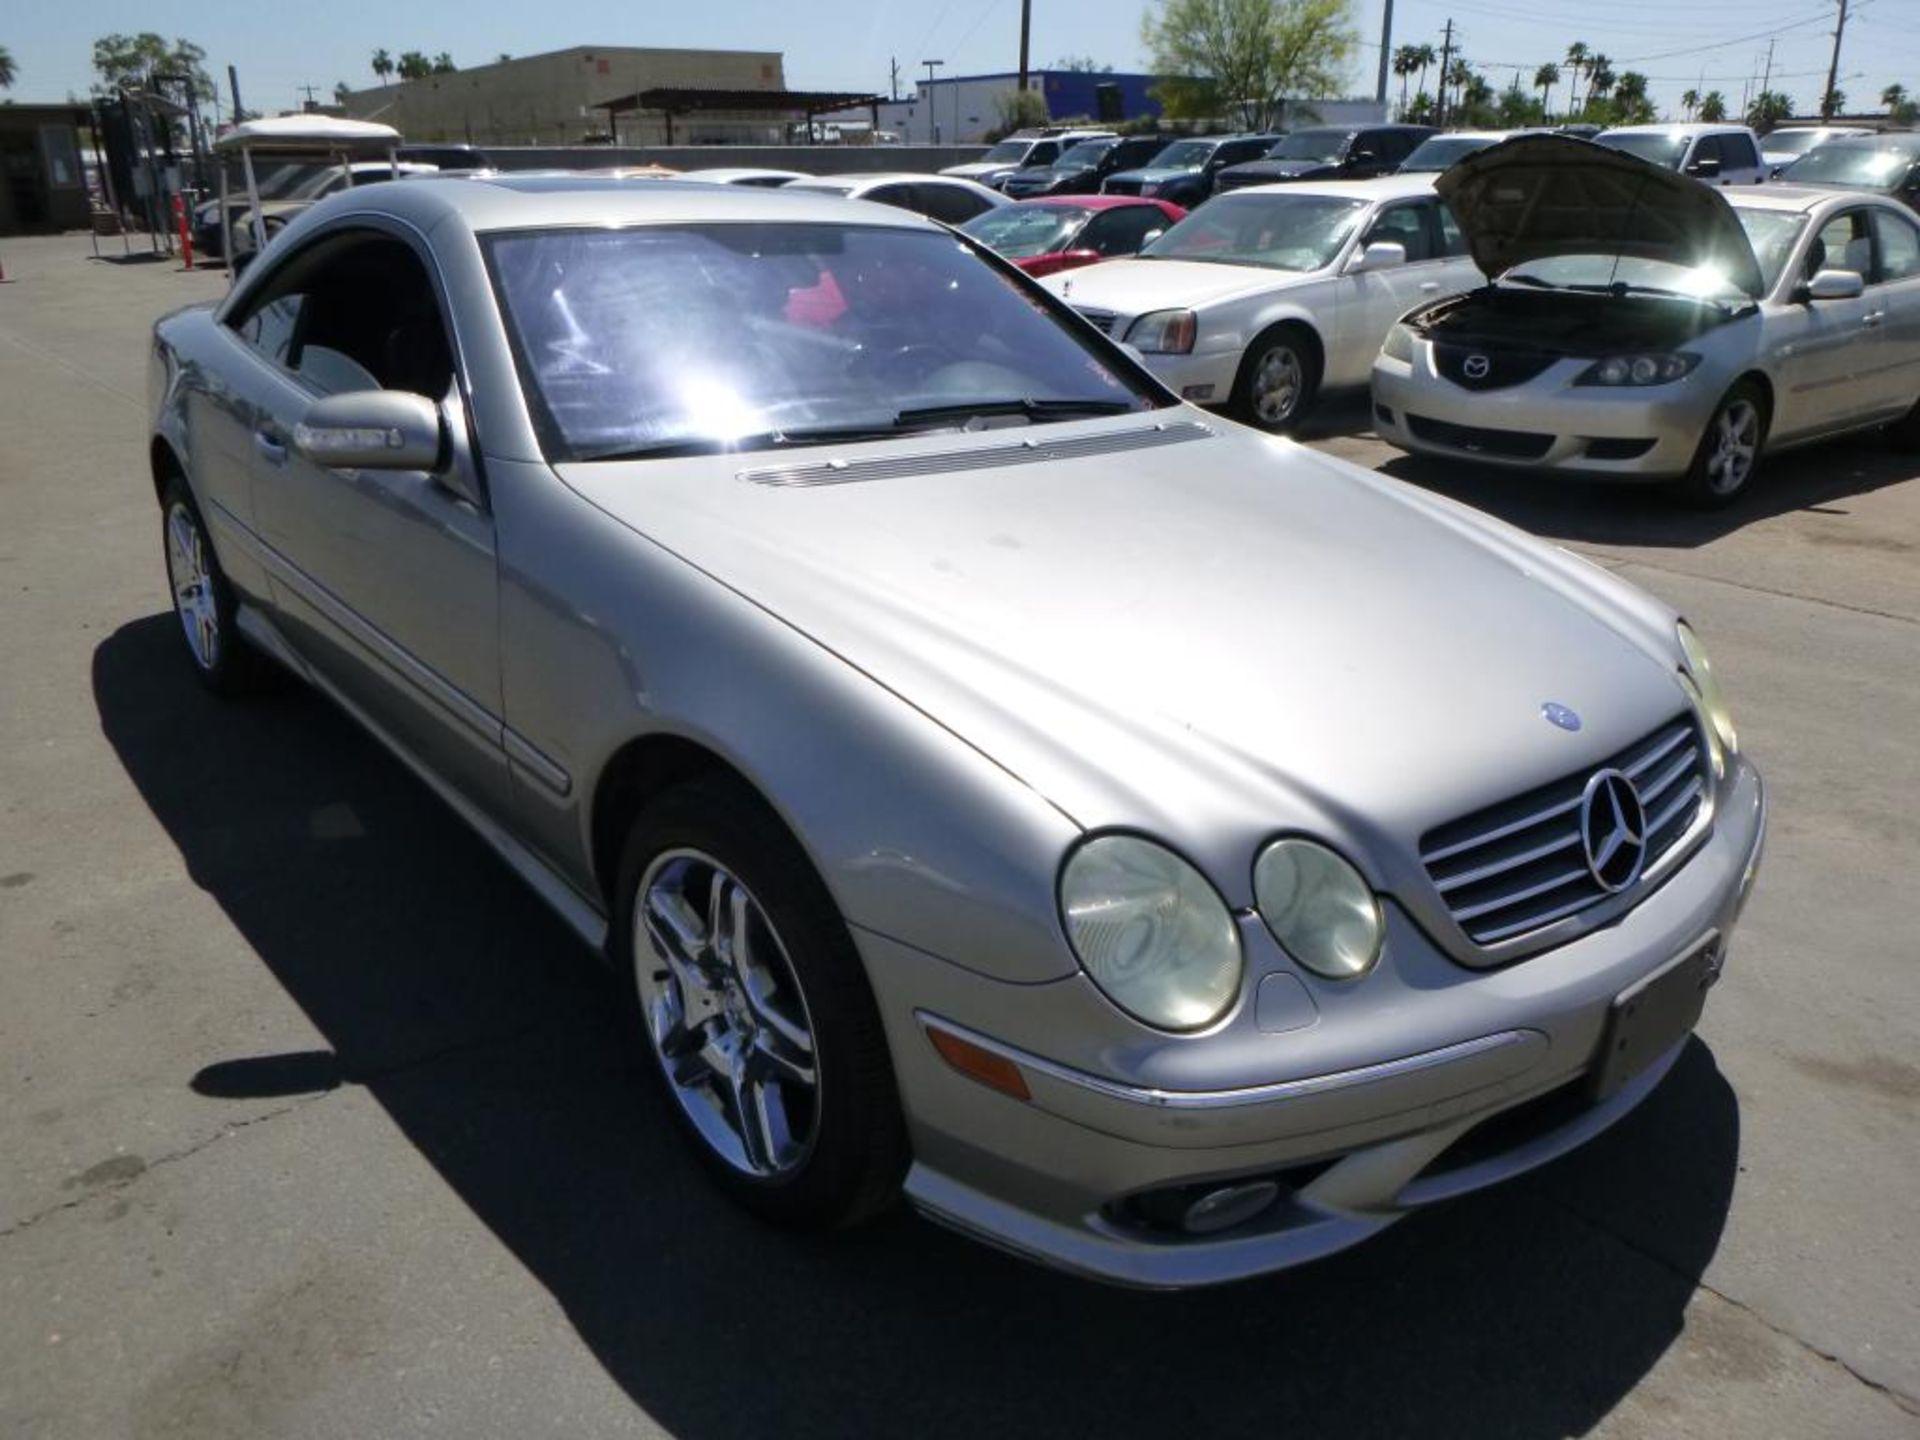 2004 Mercedes-Benz CL-Class - Image 2 of 15